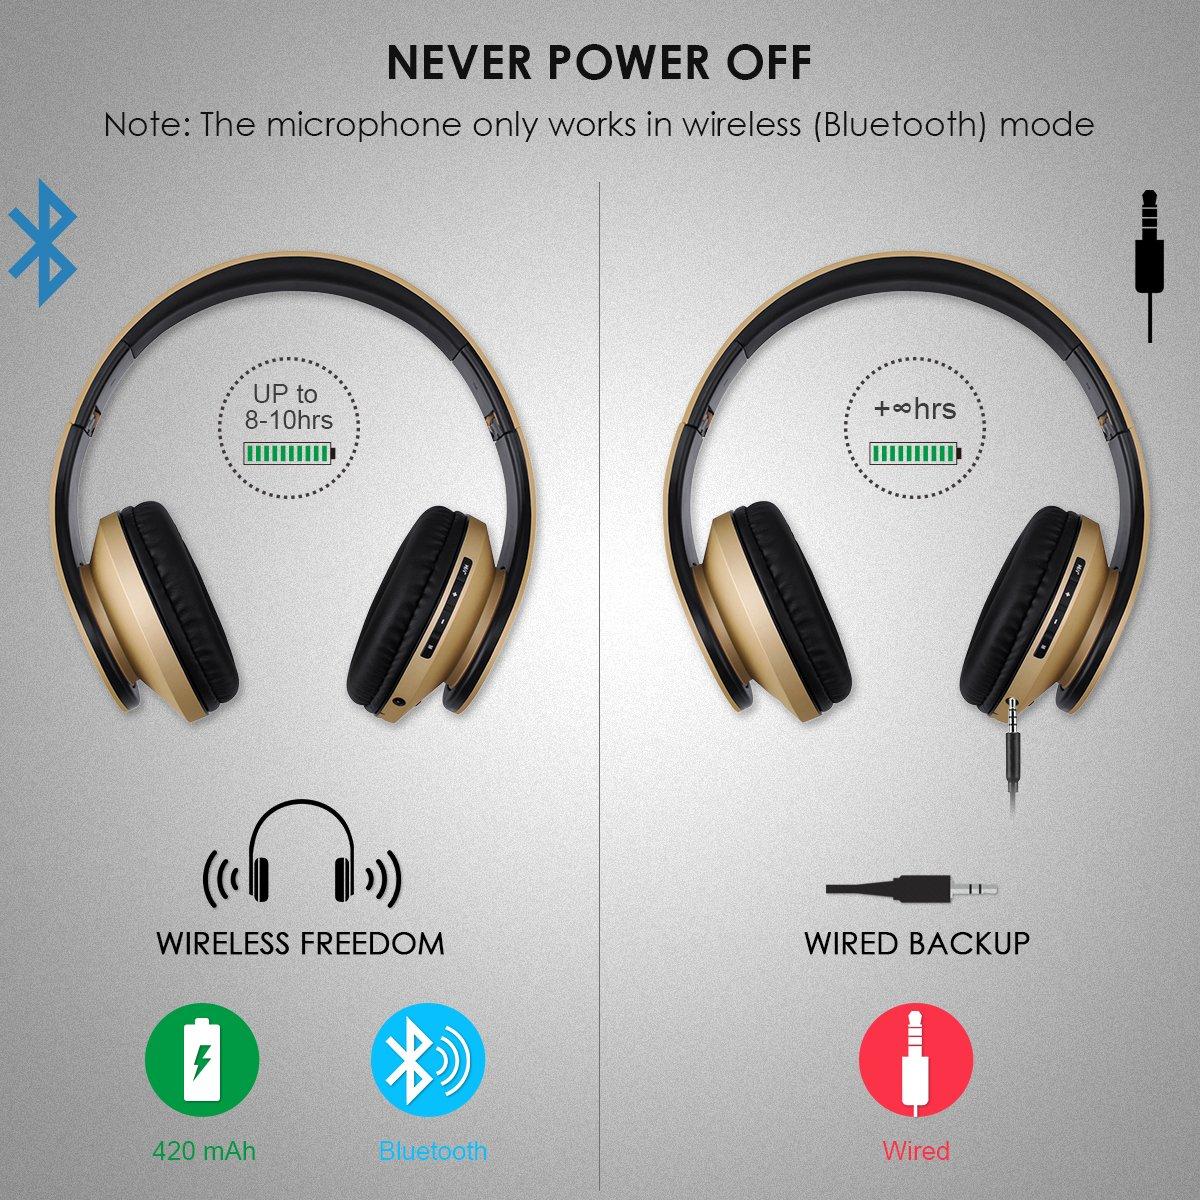 Amazon.com: Bluetooth Headphones, 4 in 1 Upgraded Over Ear Wireless ...